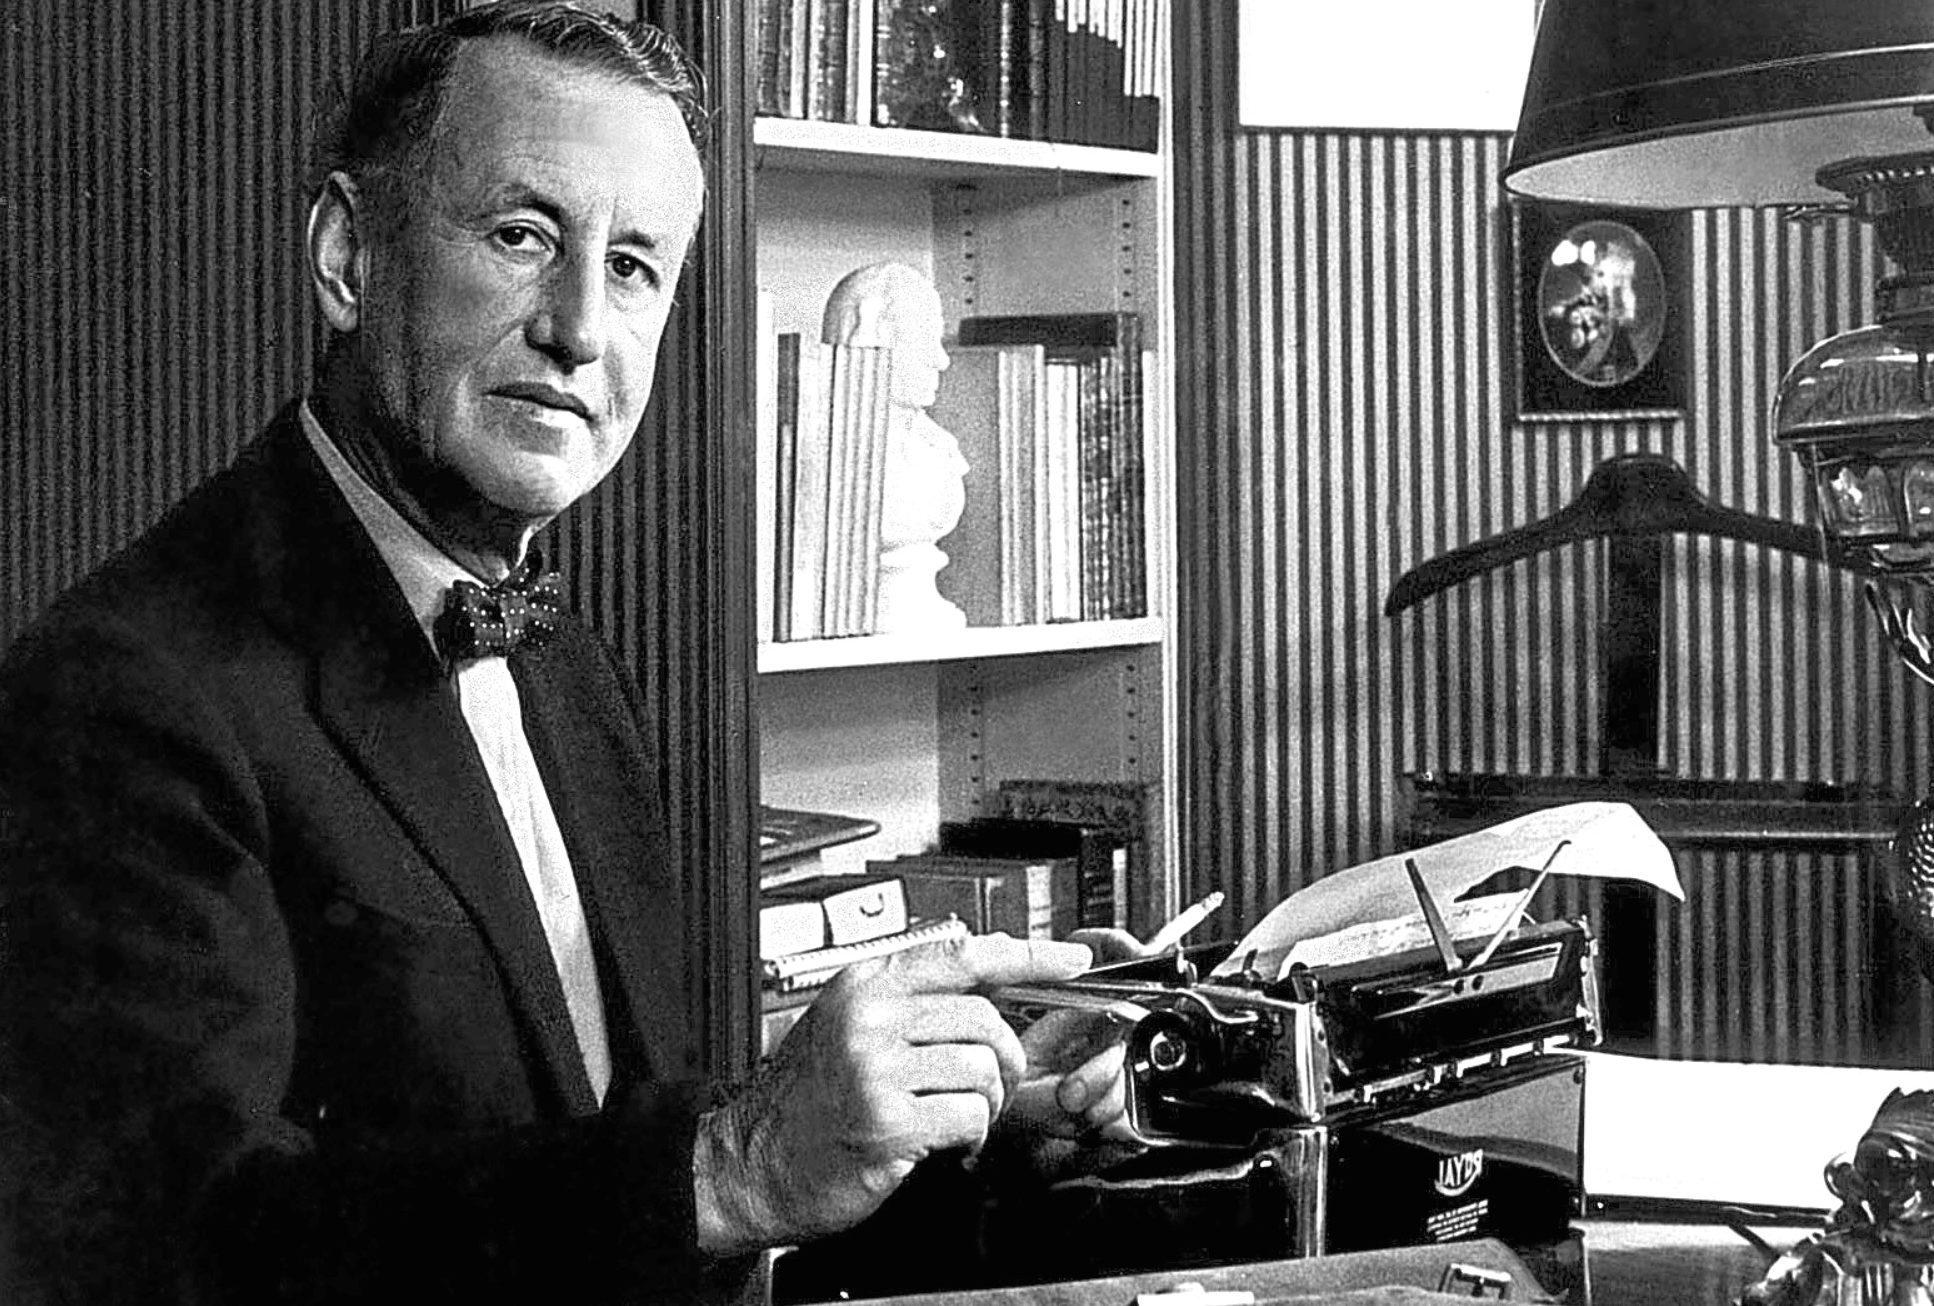 James Bond author Ian Fleming, 1958